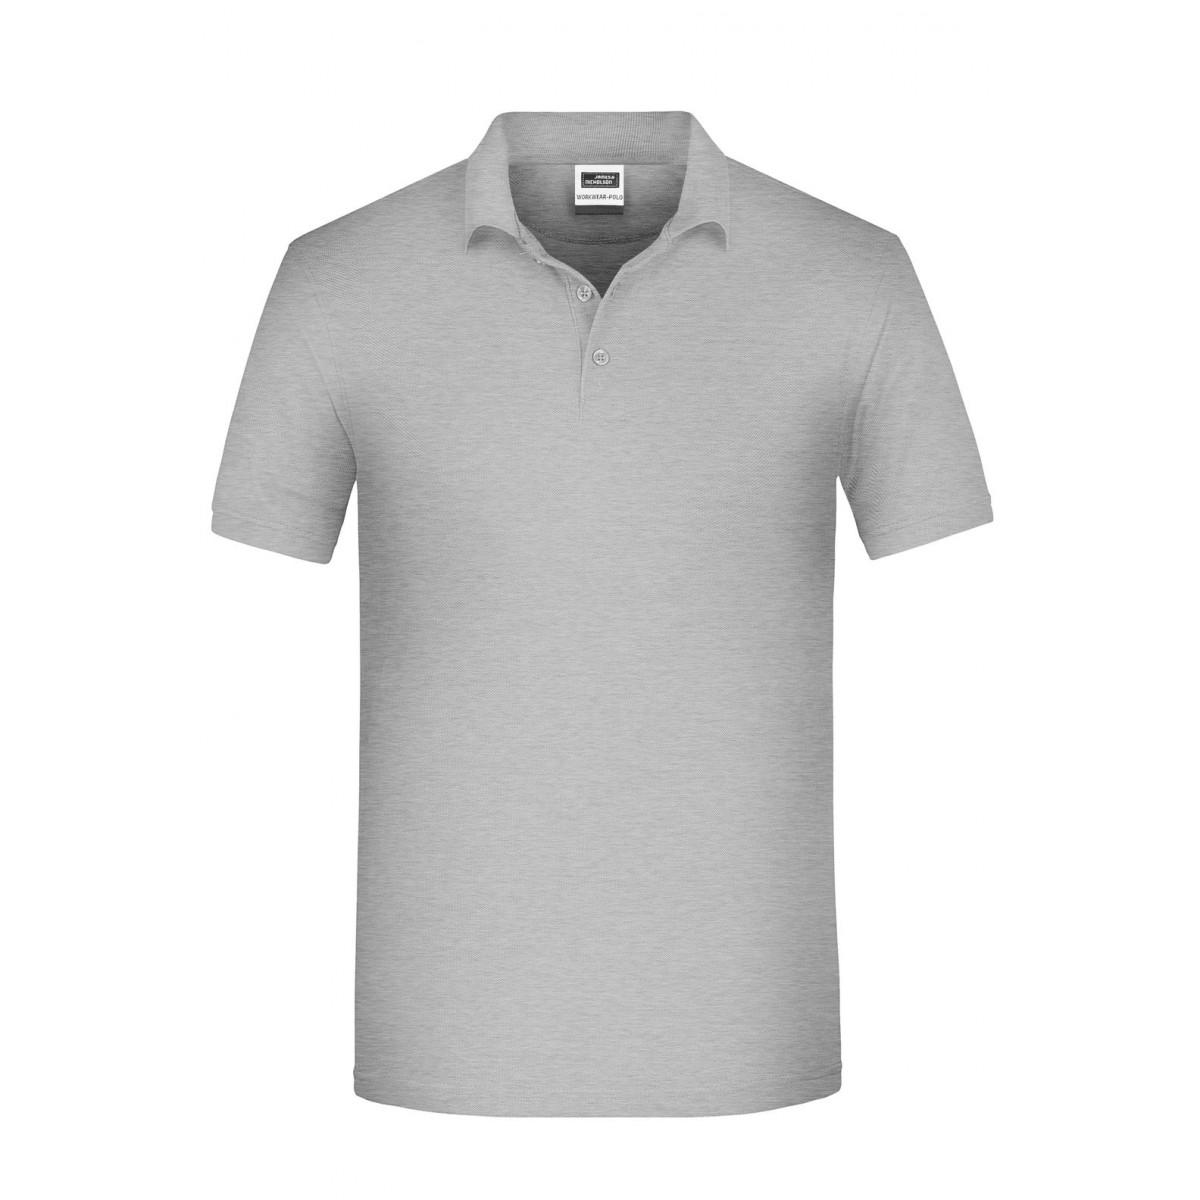 Рубашка поло мужская JN874 Mens BIO Workwear Polo - Серый меланж